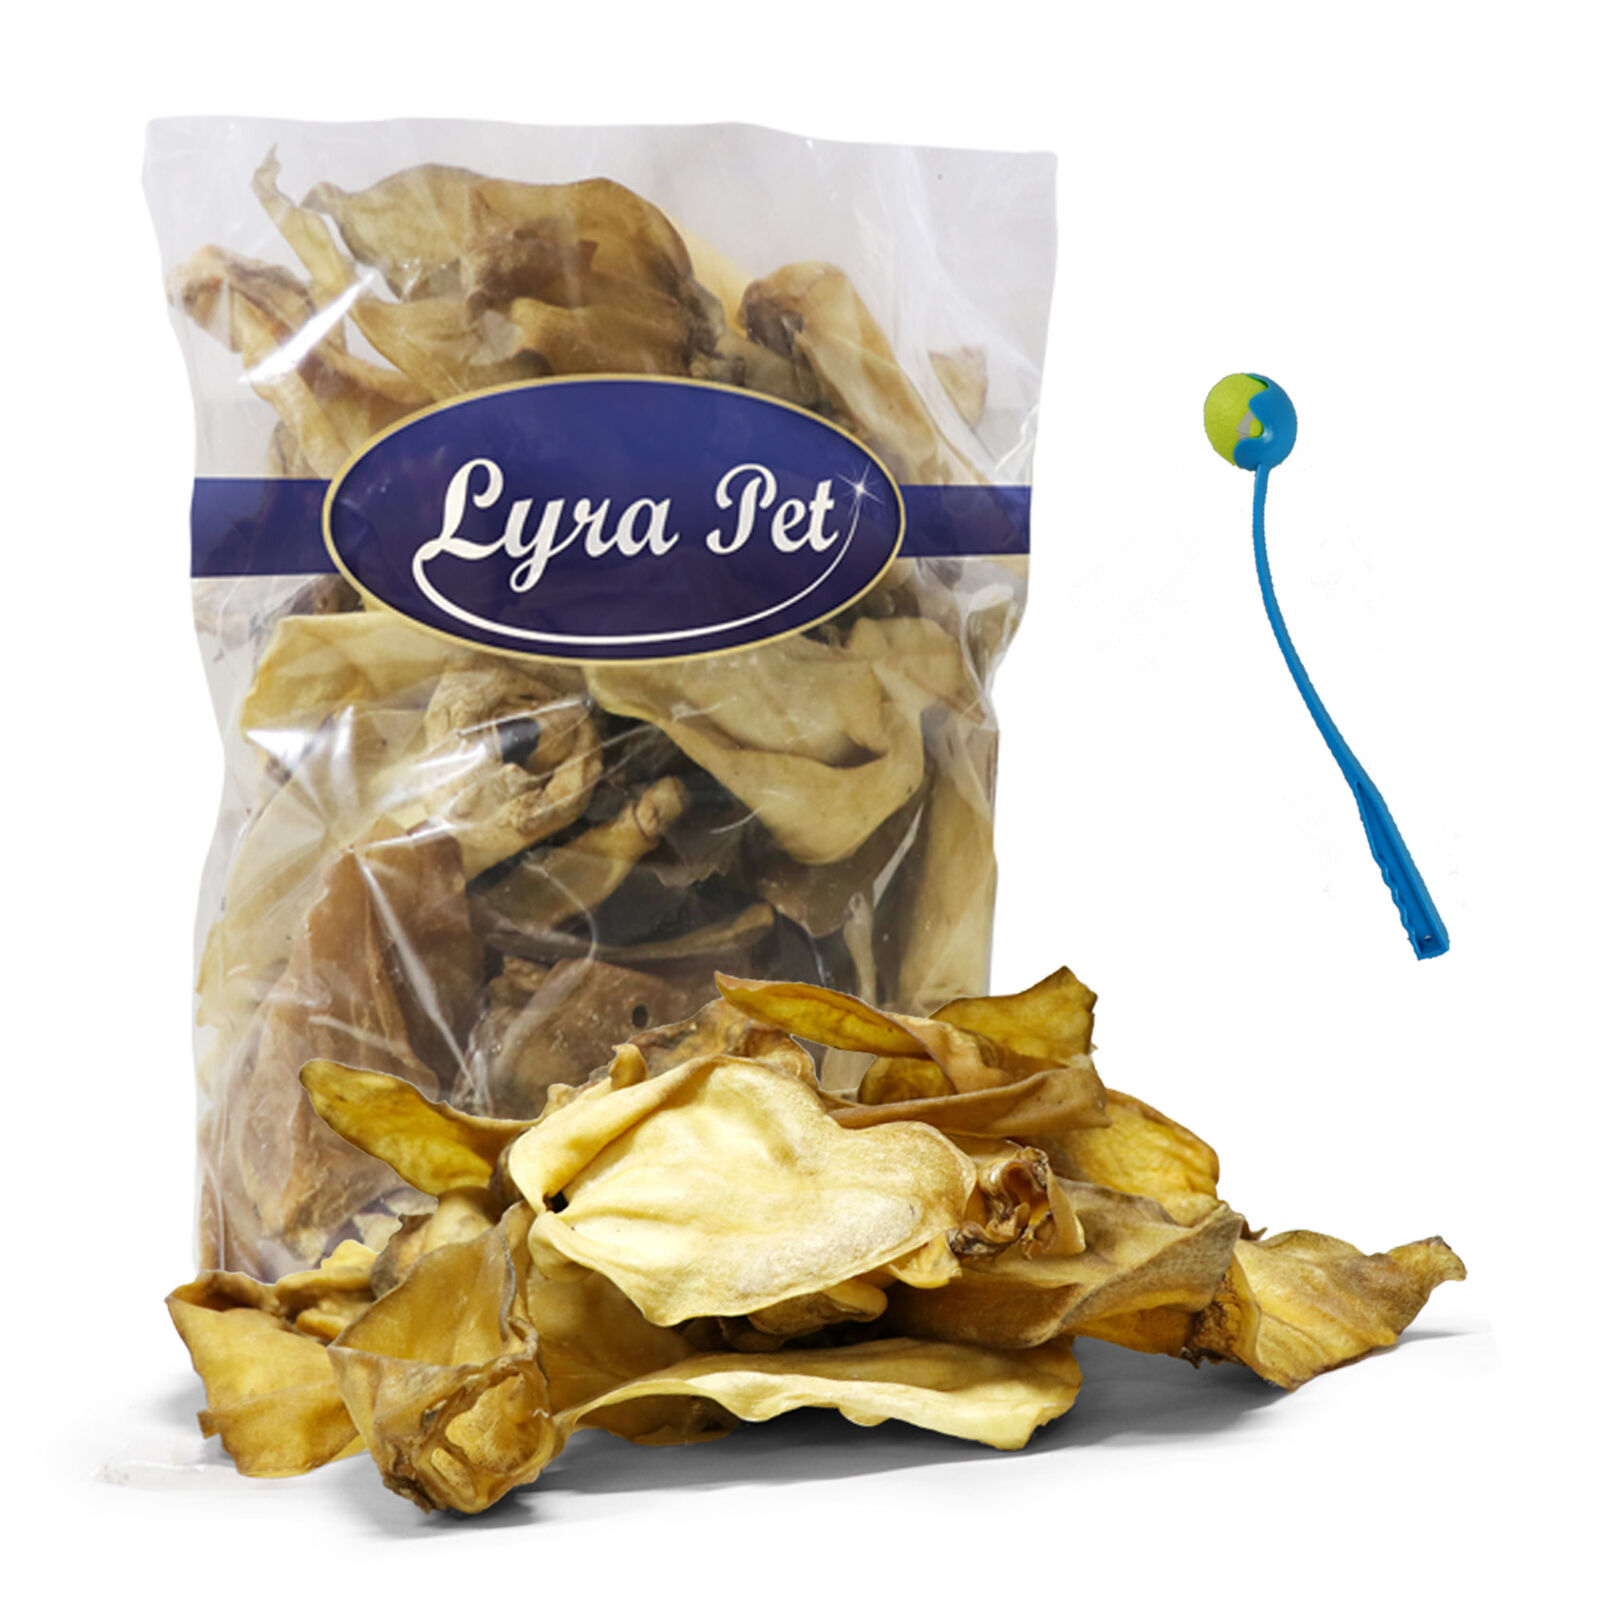 200 Stück Rinderohren ca. 14 kg Hundefutter Ohren Rind Lyra Pet ® +Ballschleuder